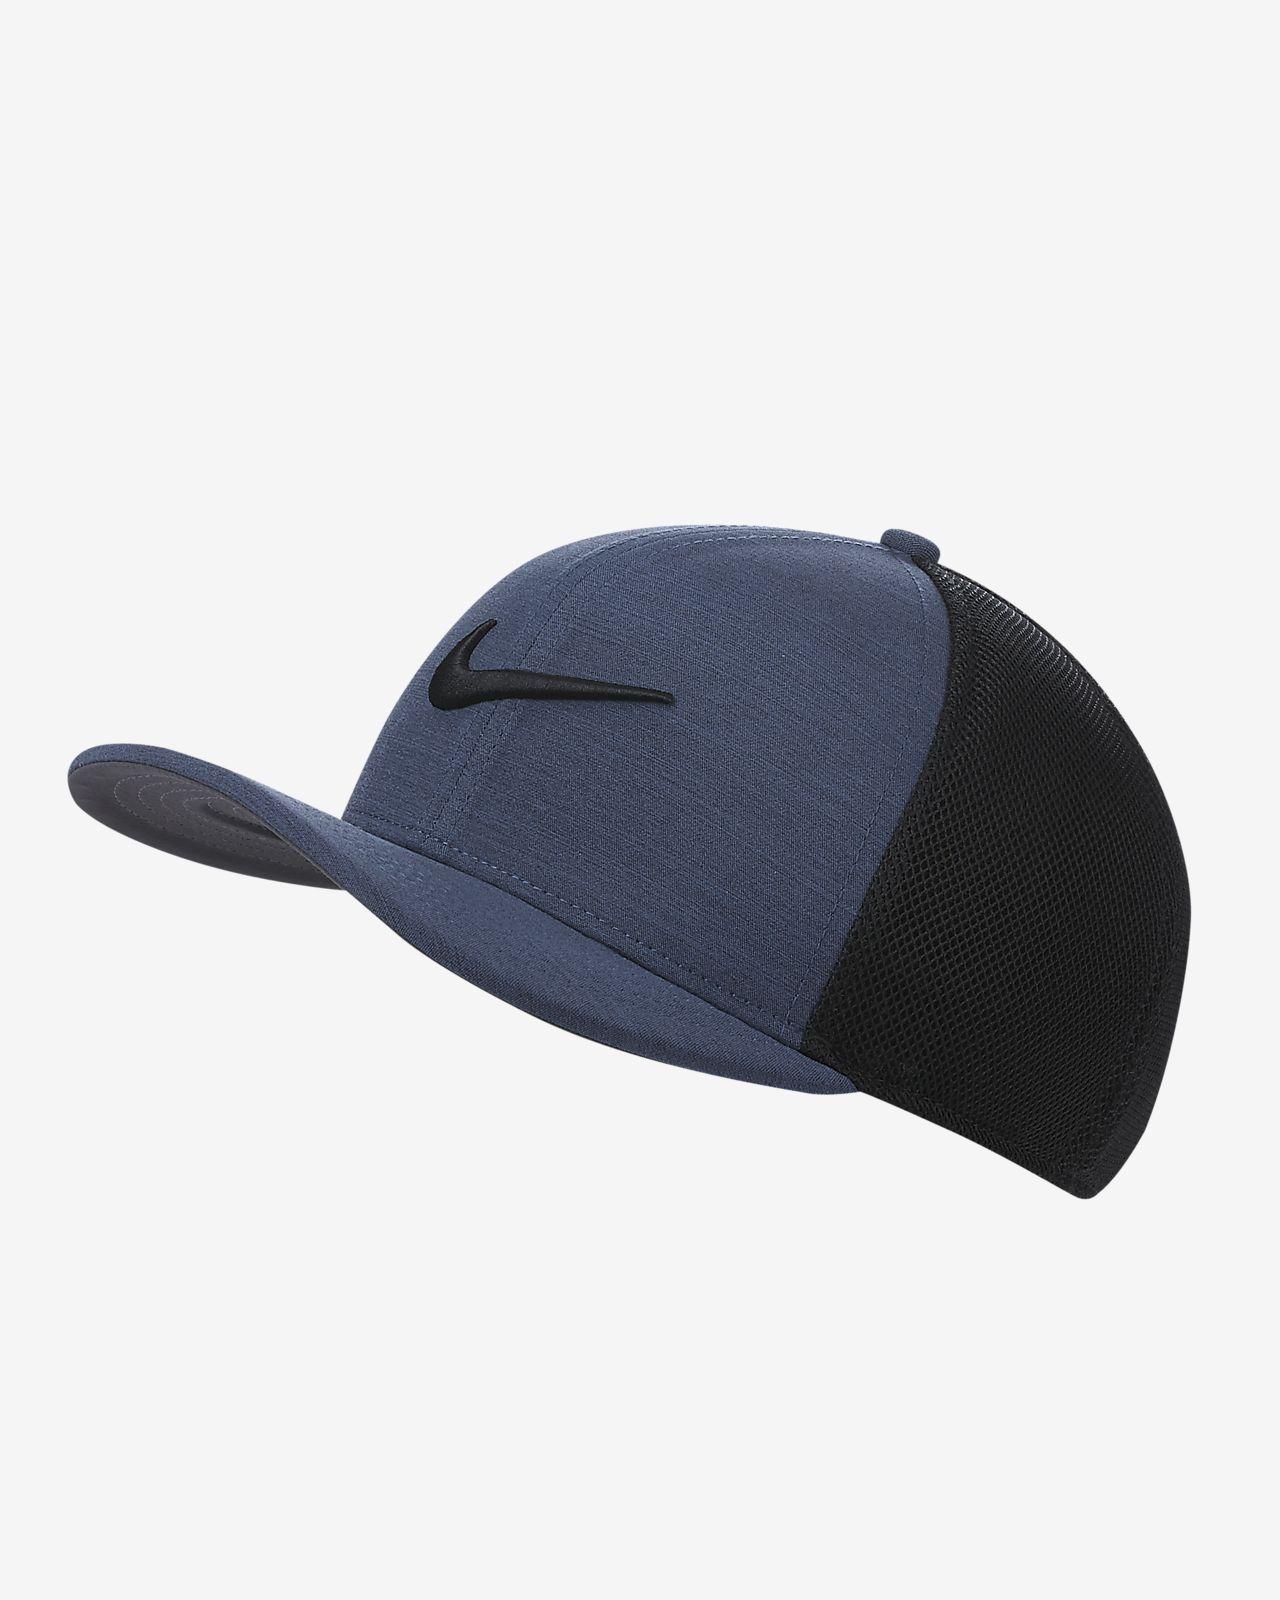 46e5c379 Nike AeroBill Classic99 Mesh Golf Hat. Nike.com